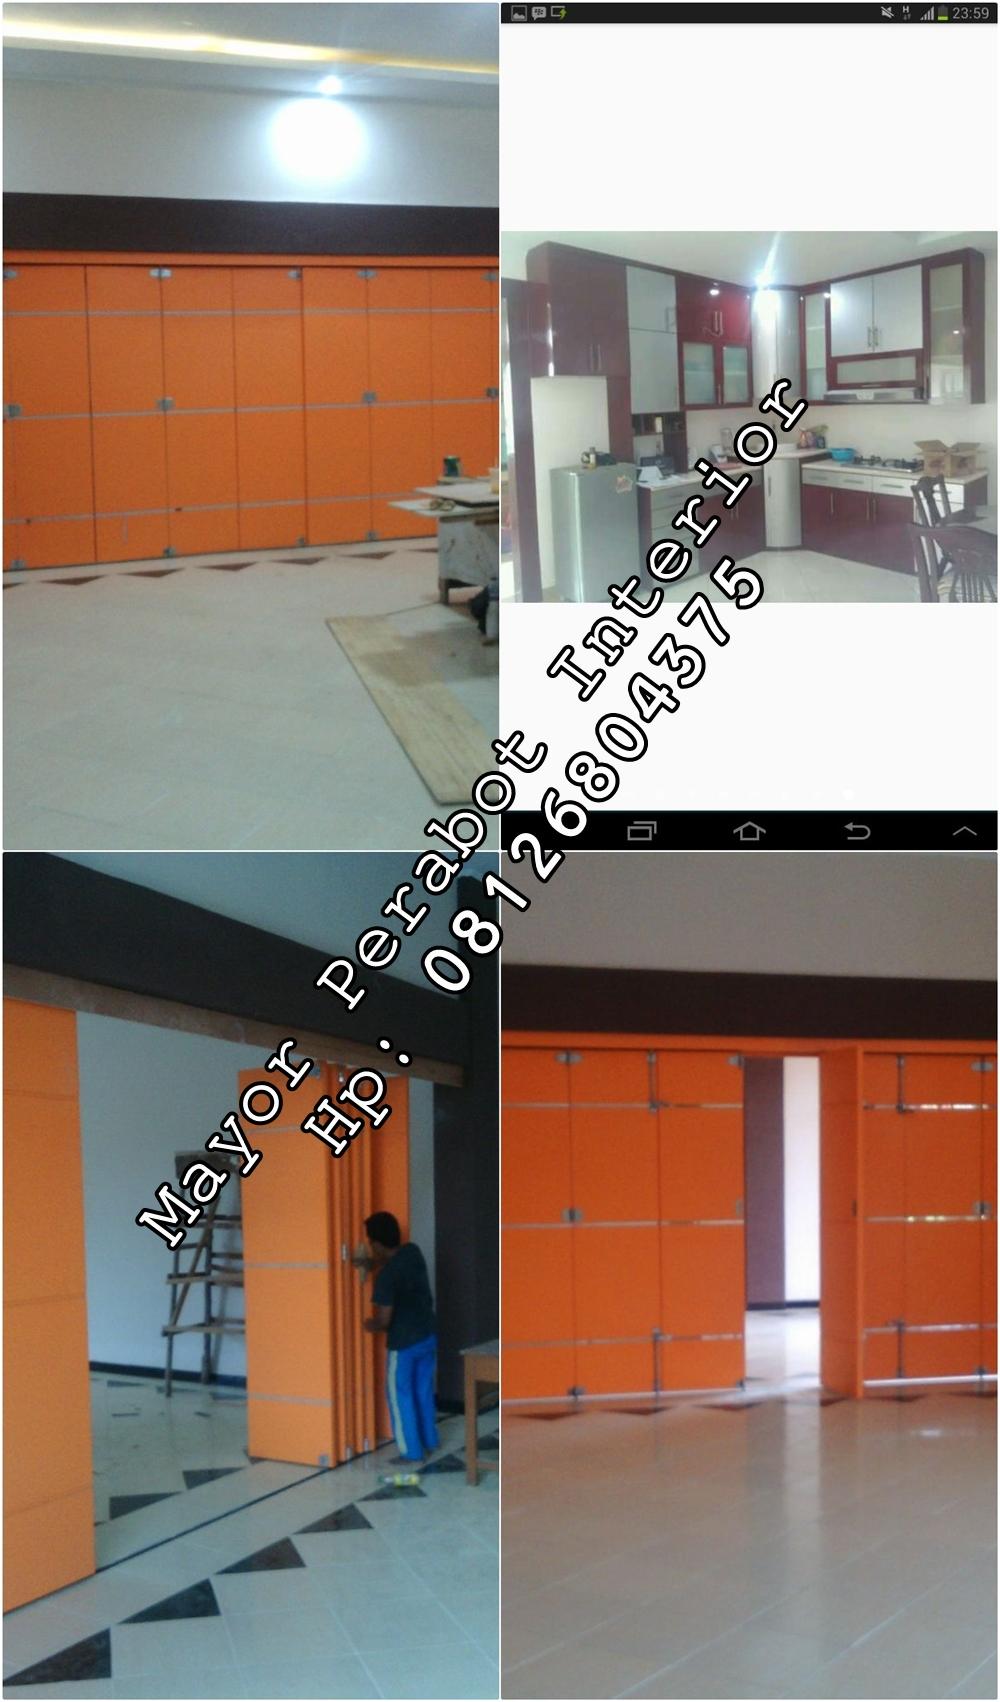 Mayor Perabot Interior 6 - Mayor Perabot Interior | Perabot Interior Pekanbaru